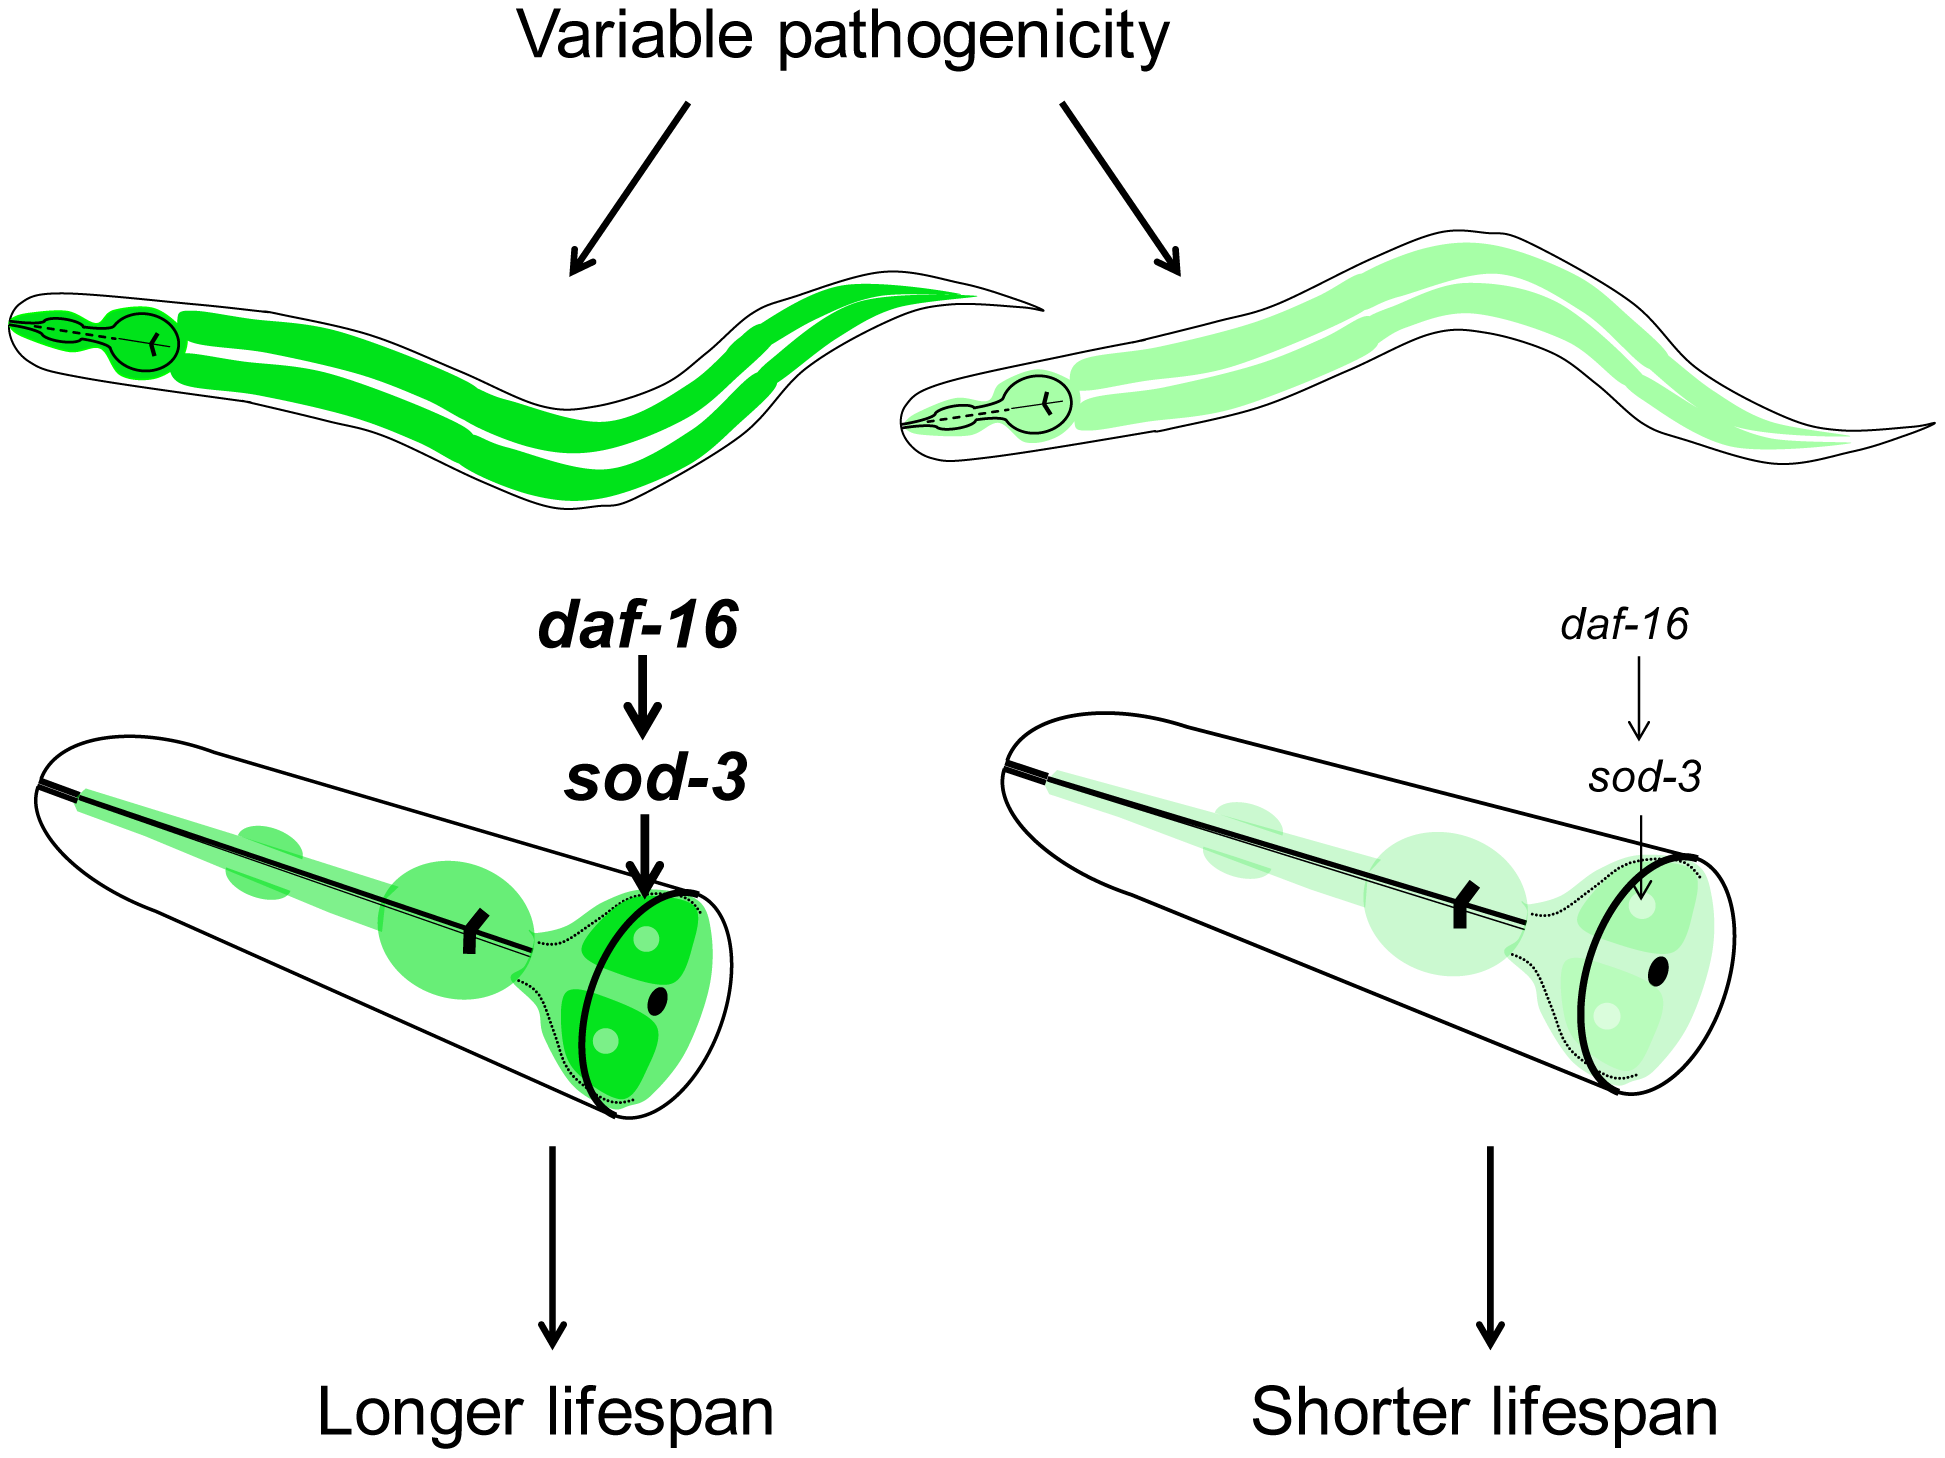 Model for lifespan variability in <i>C. elegans</i>.